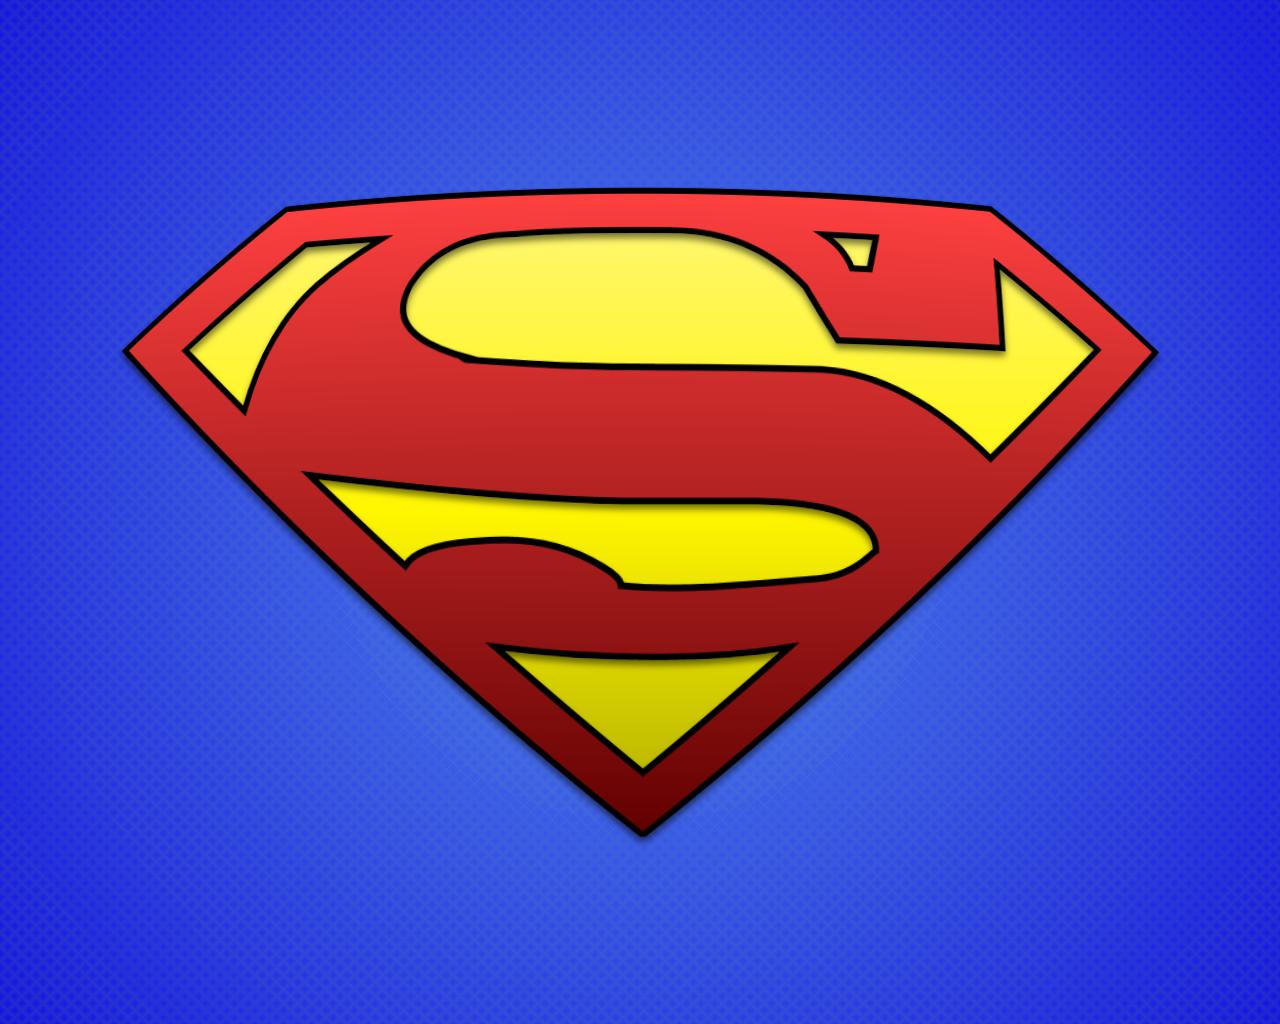 Free Superman Symbol, Download Free Clip Art, Free Clip Art.